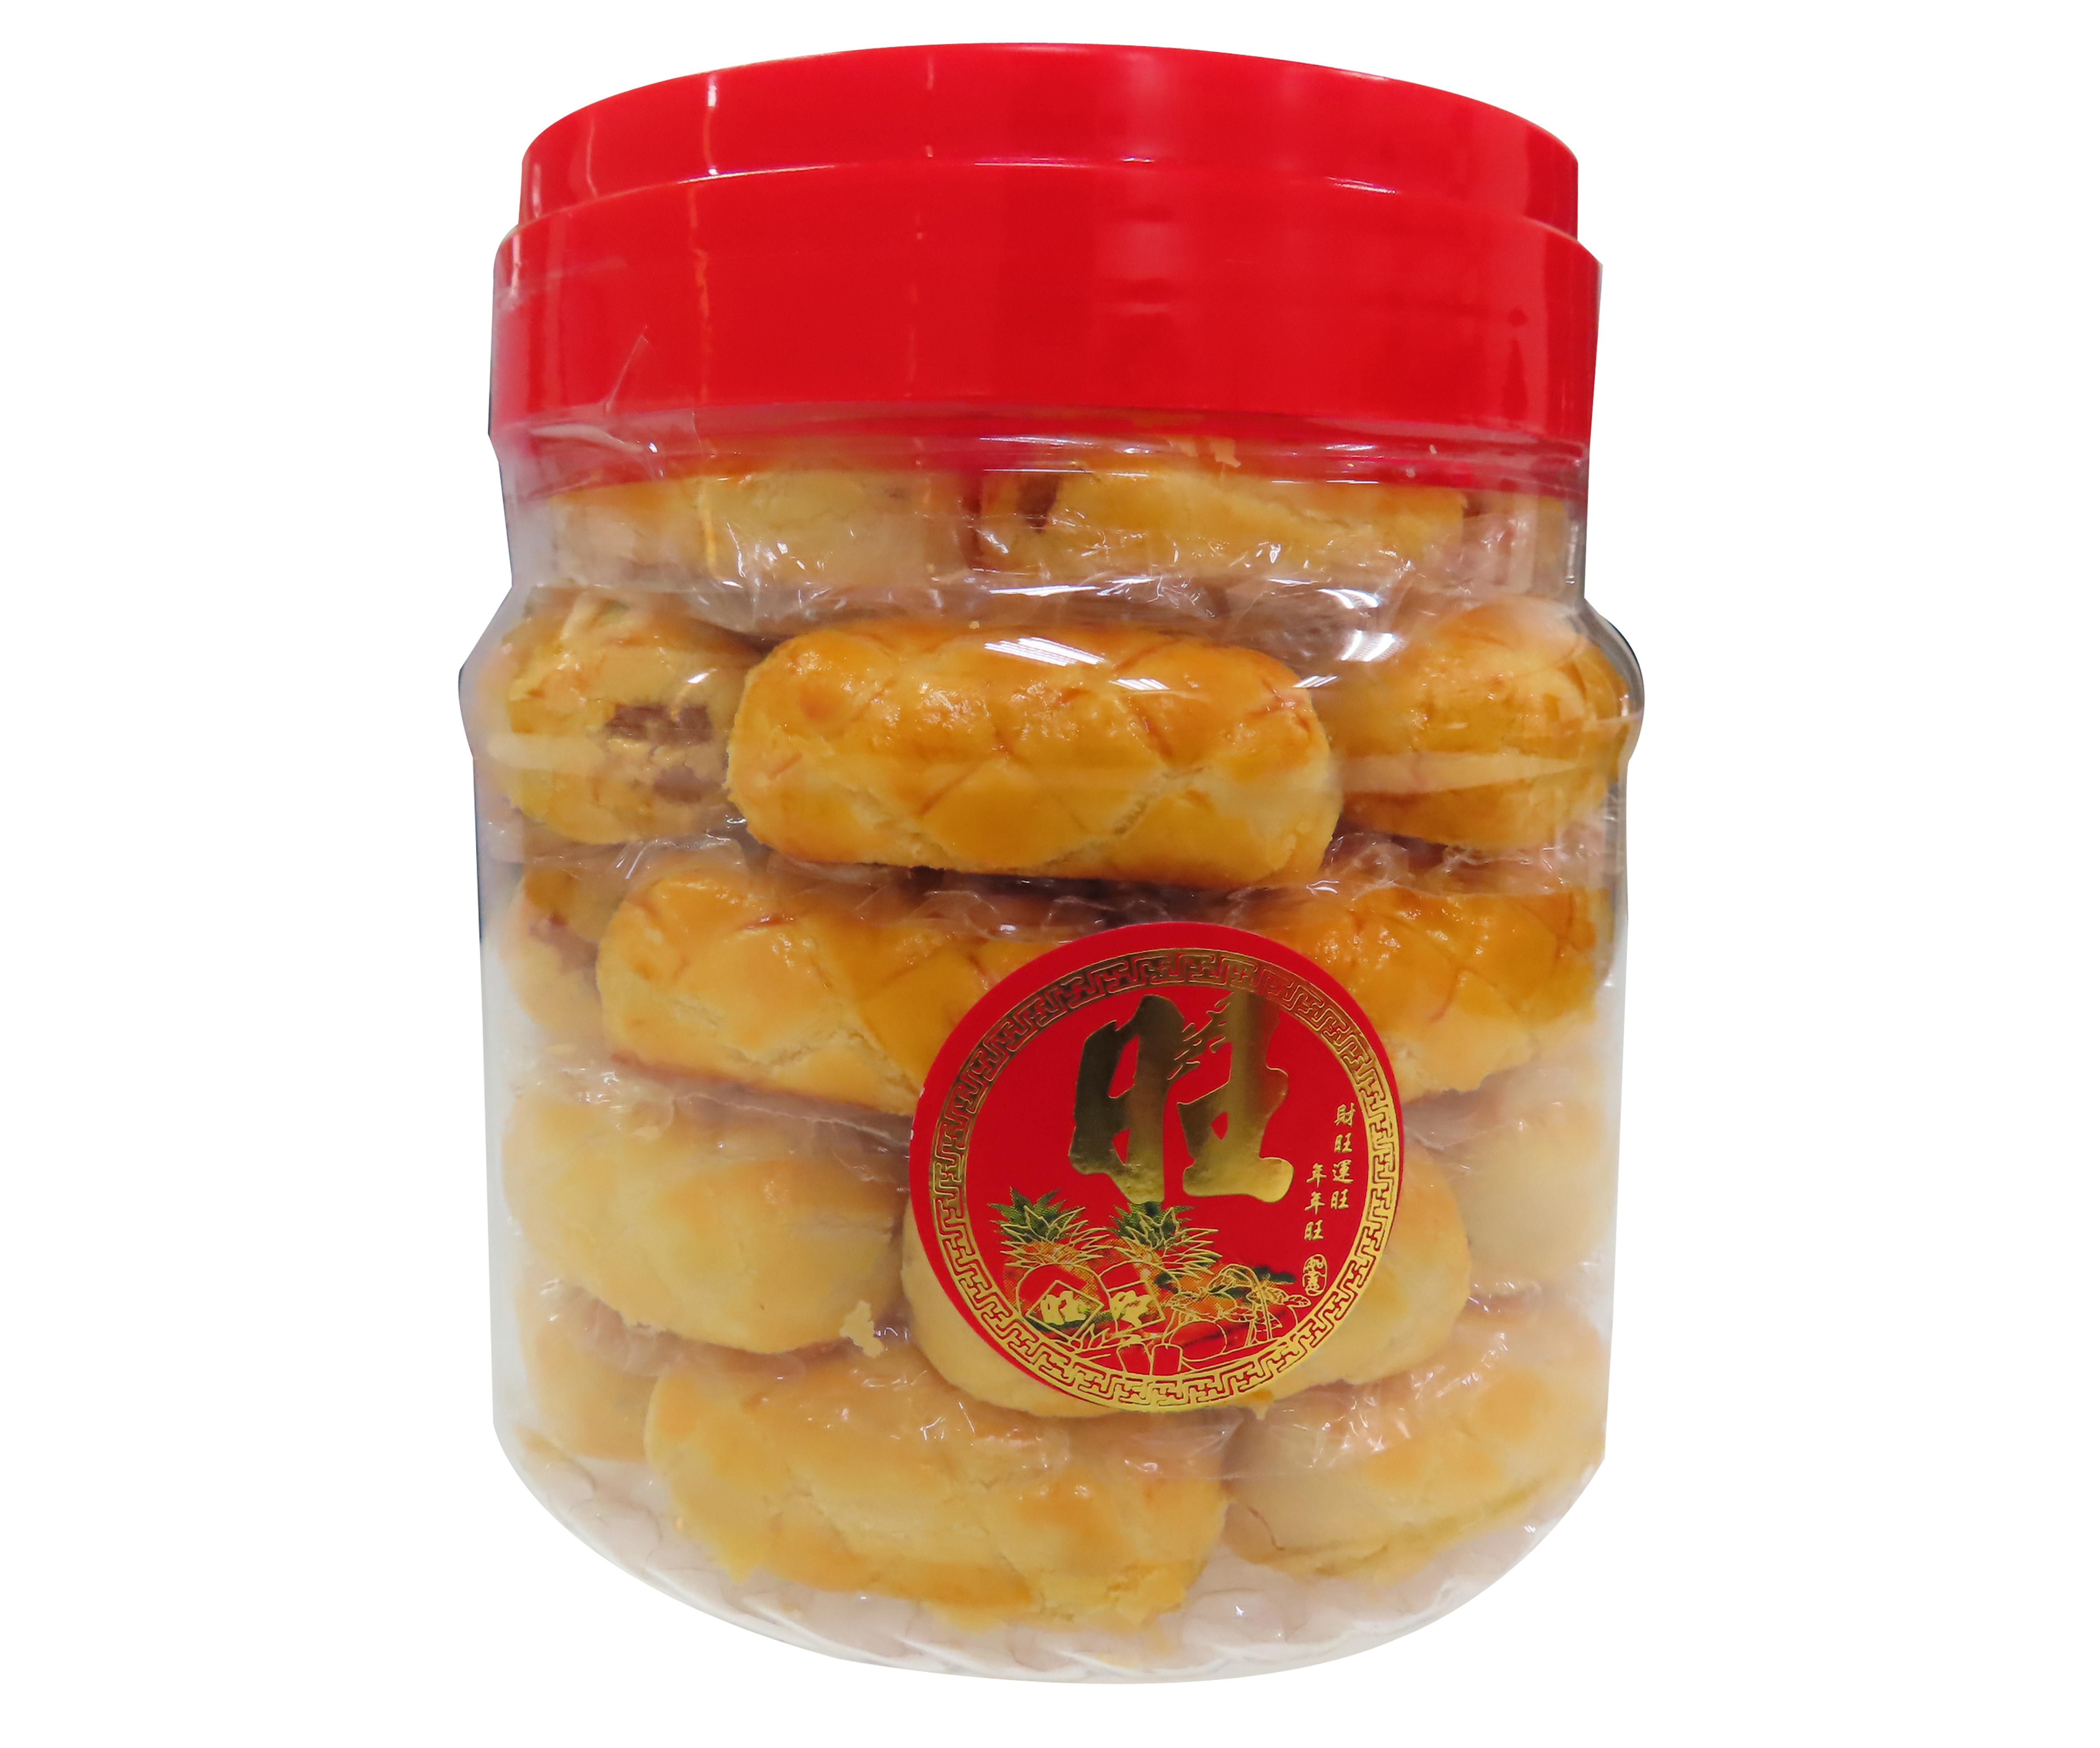 Image Pineapple Tart Pineapple tarts A13 高级金條酥(蛋素) 350g